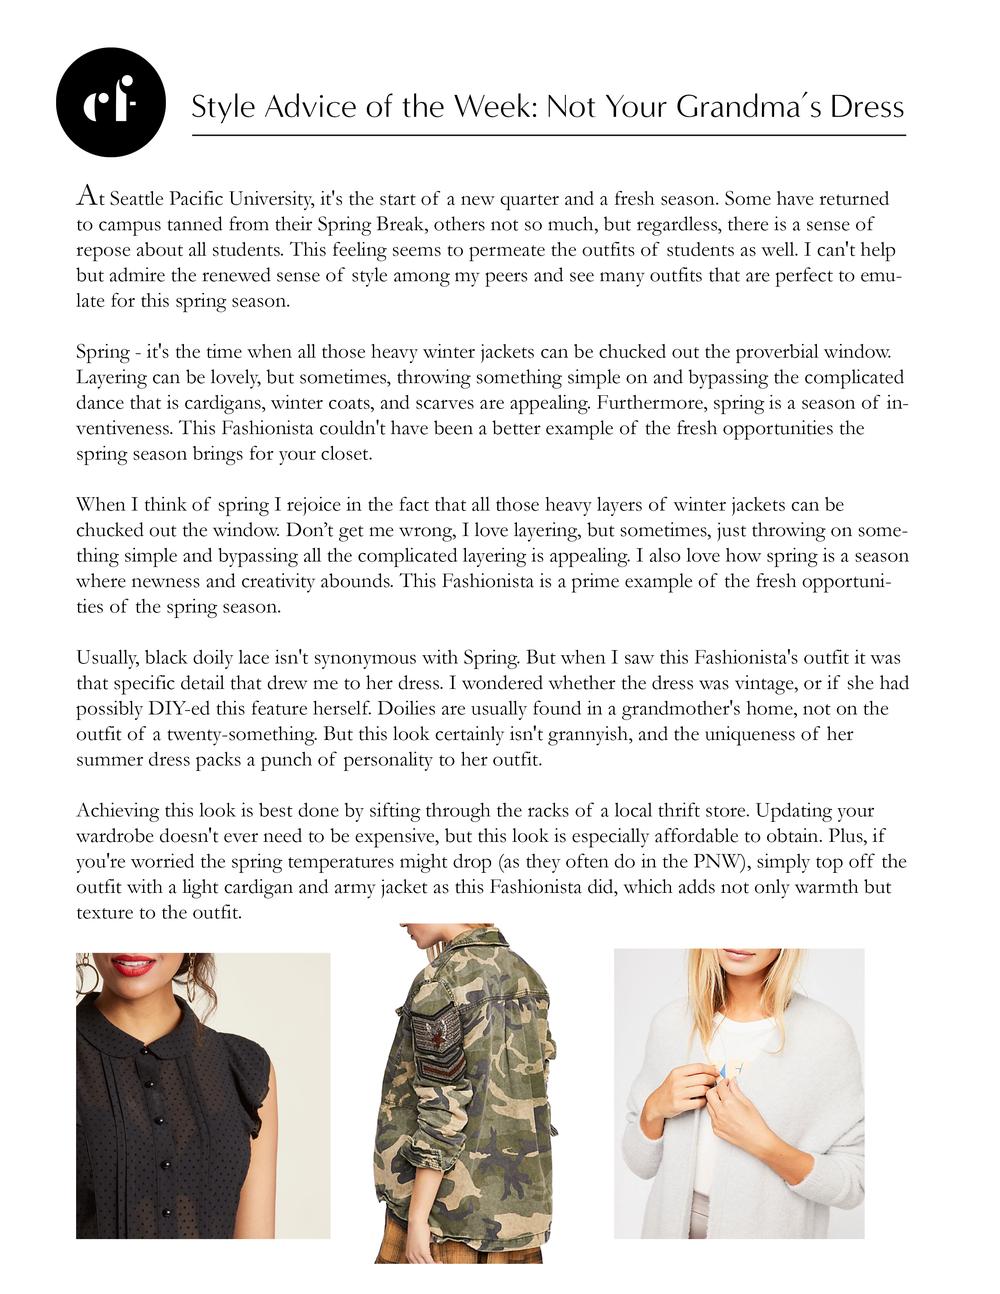 StyleAdviceoftheWeek-Not your Grandma's DressFV.png